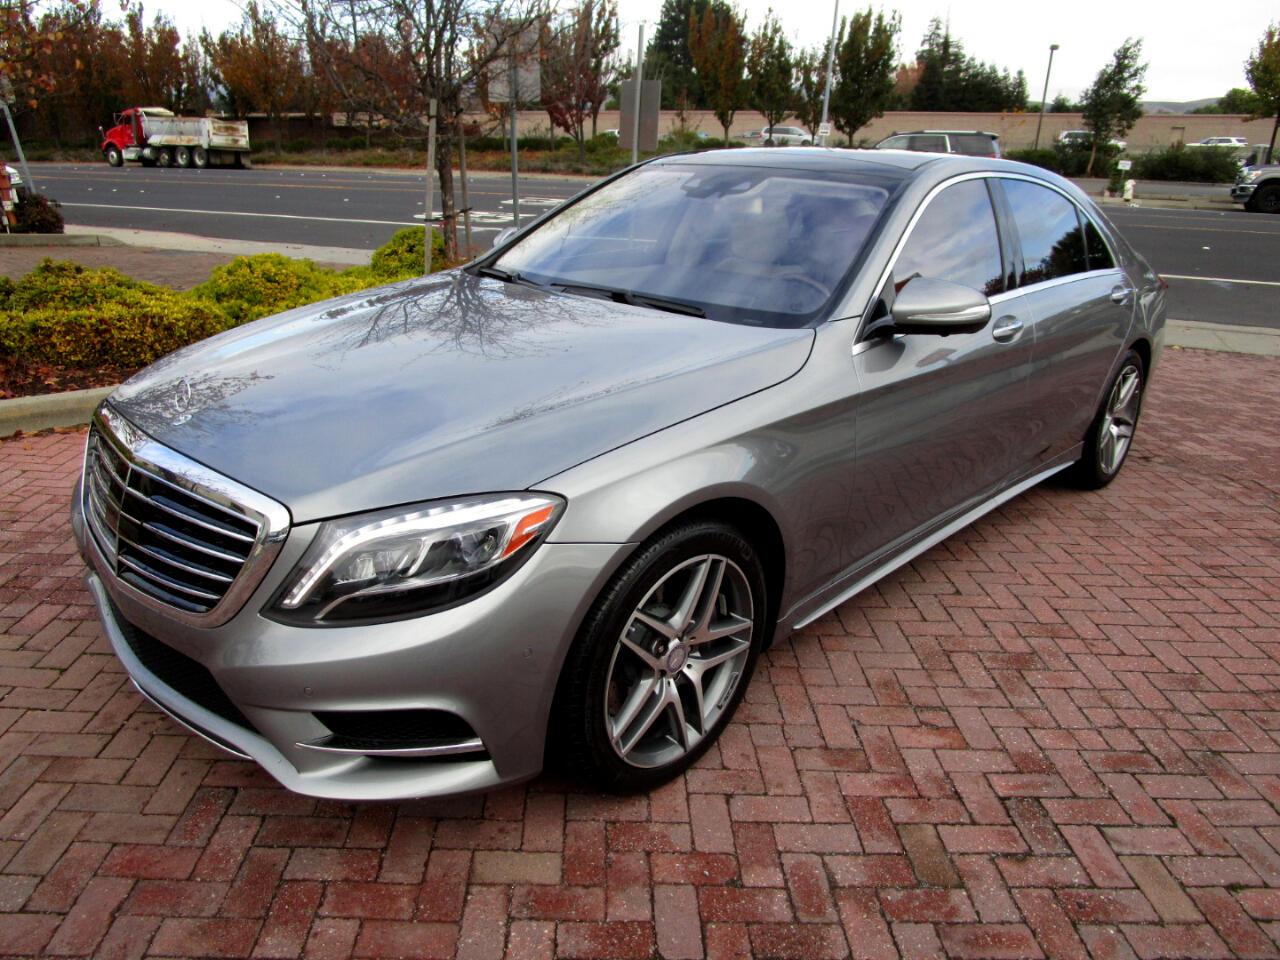 2015 Mercedes-Benz S550 AMG SPORT-PREM 1**FULL DRVR ASST*LUX SEATS*PANO*